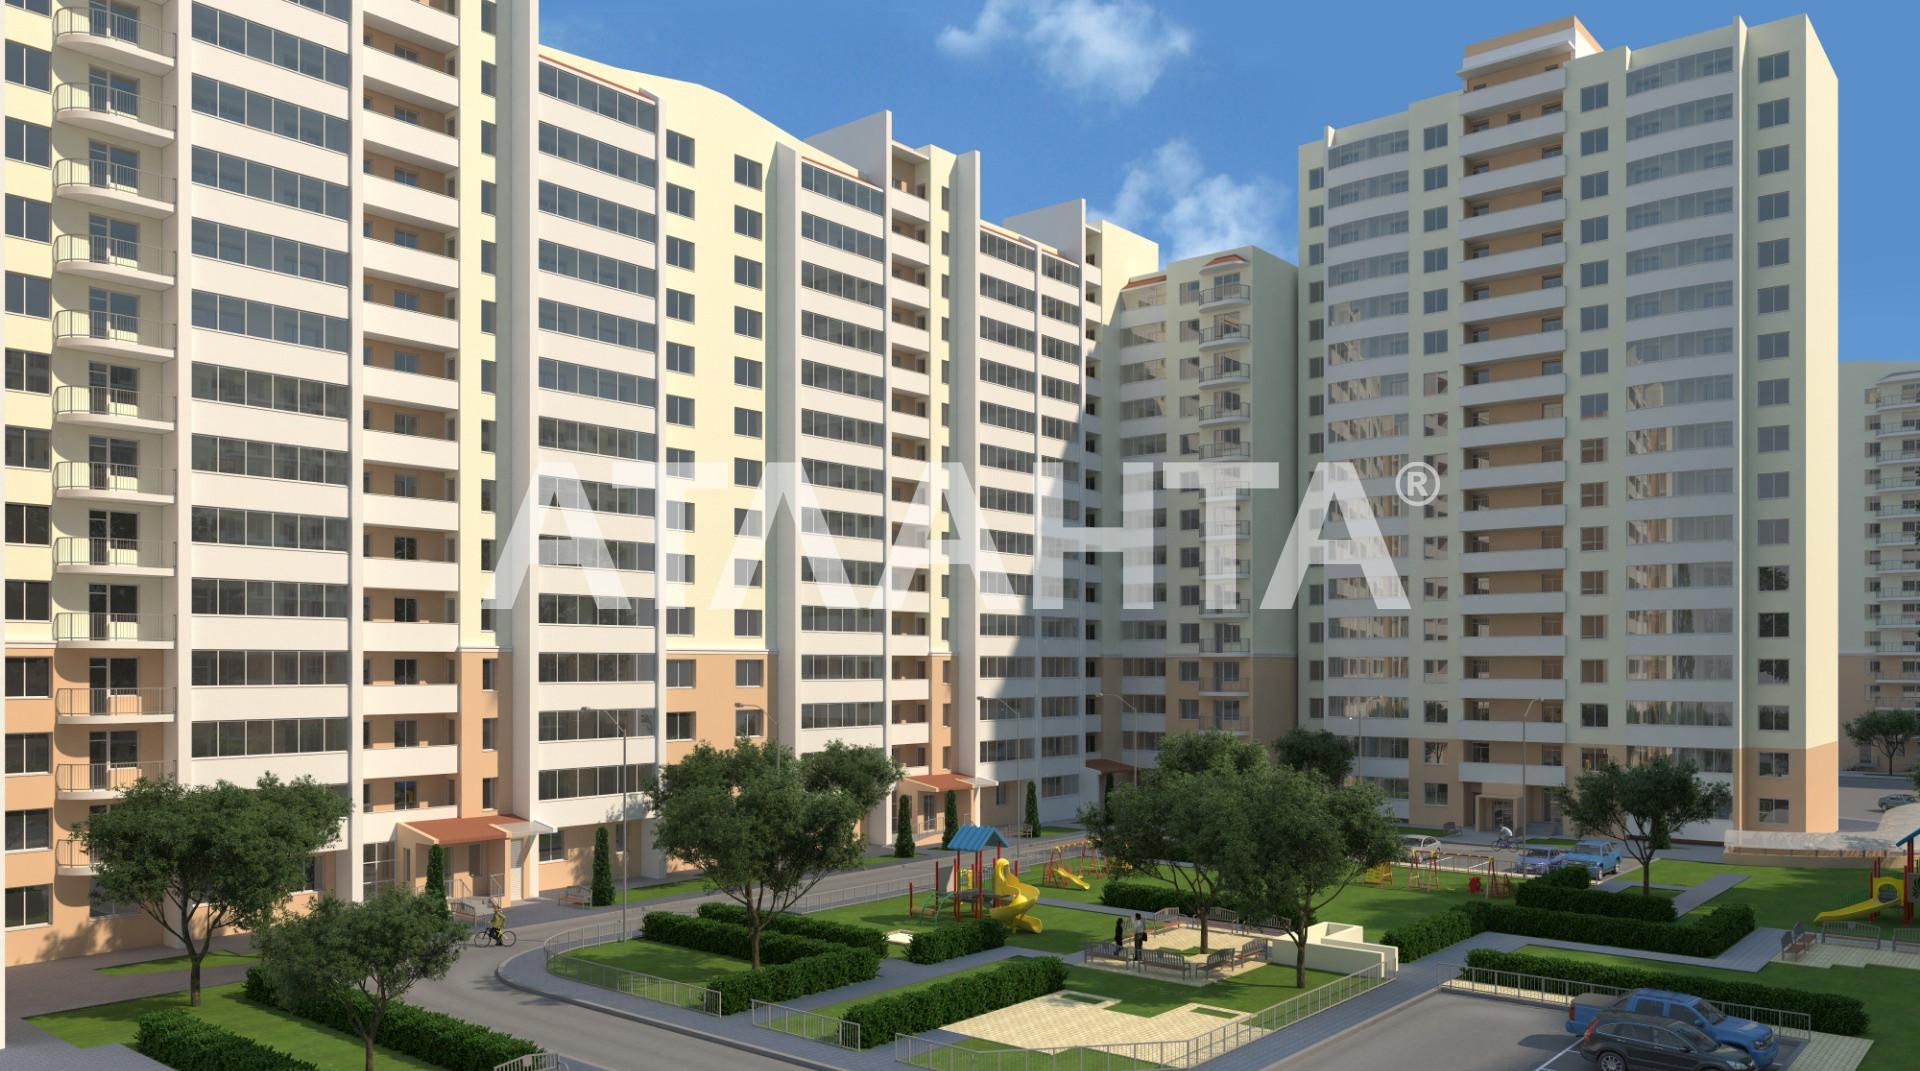 Продается 1-комнатная Квартира на ул. Костанди — 34 350 у.е.